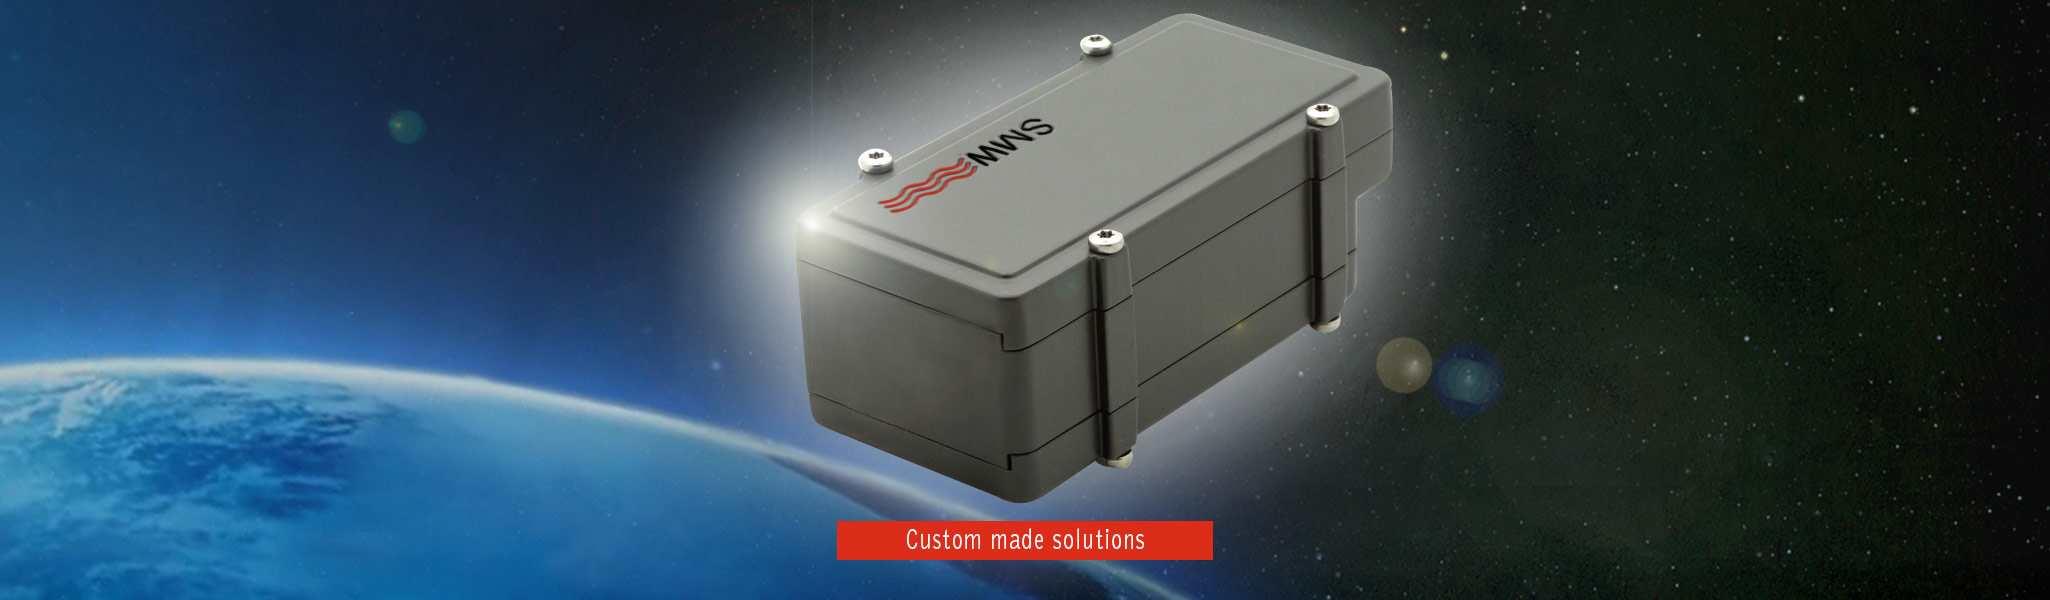 custom_made_solutions